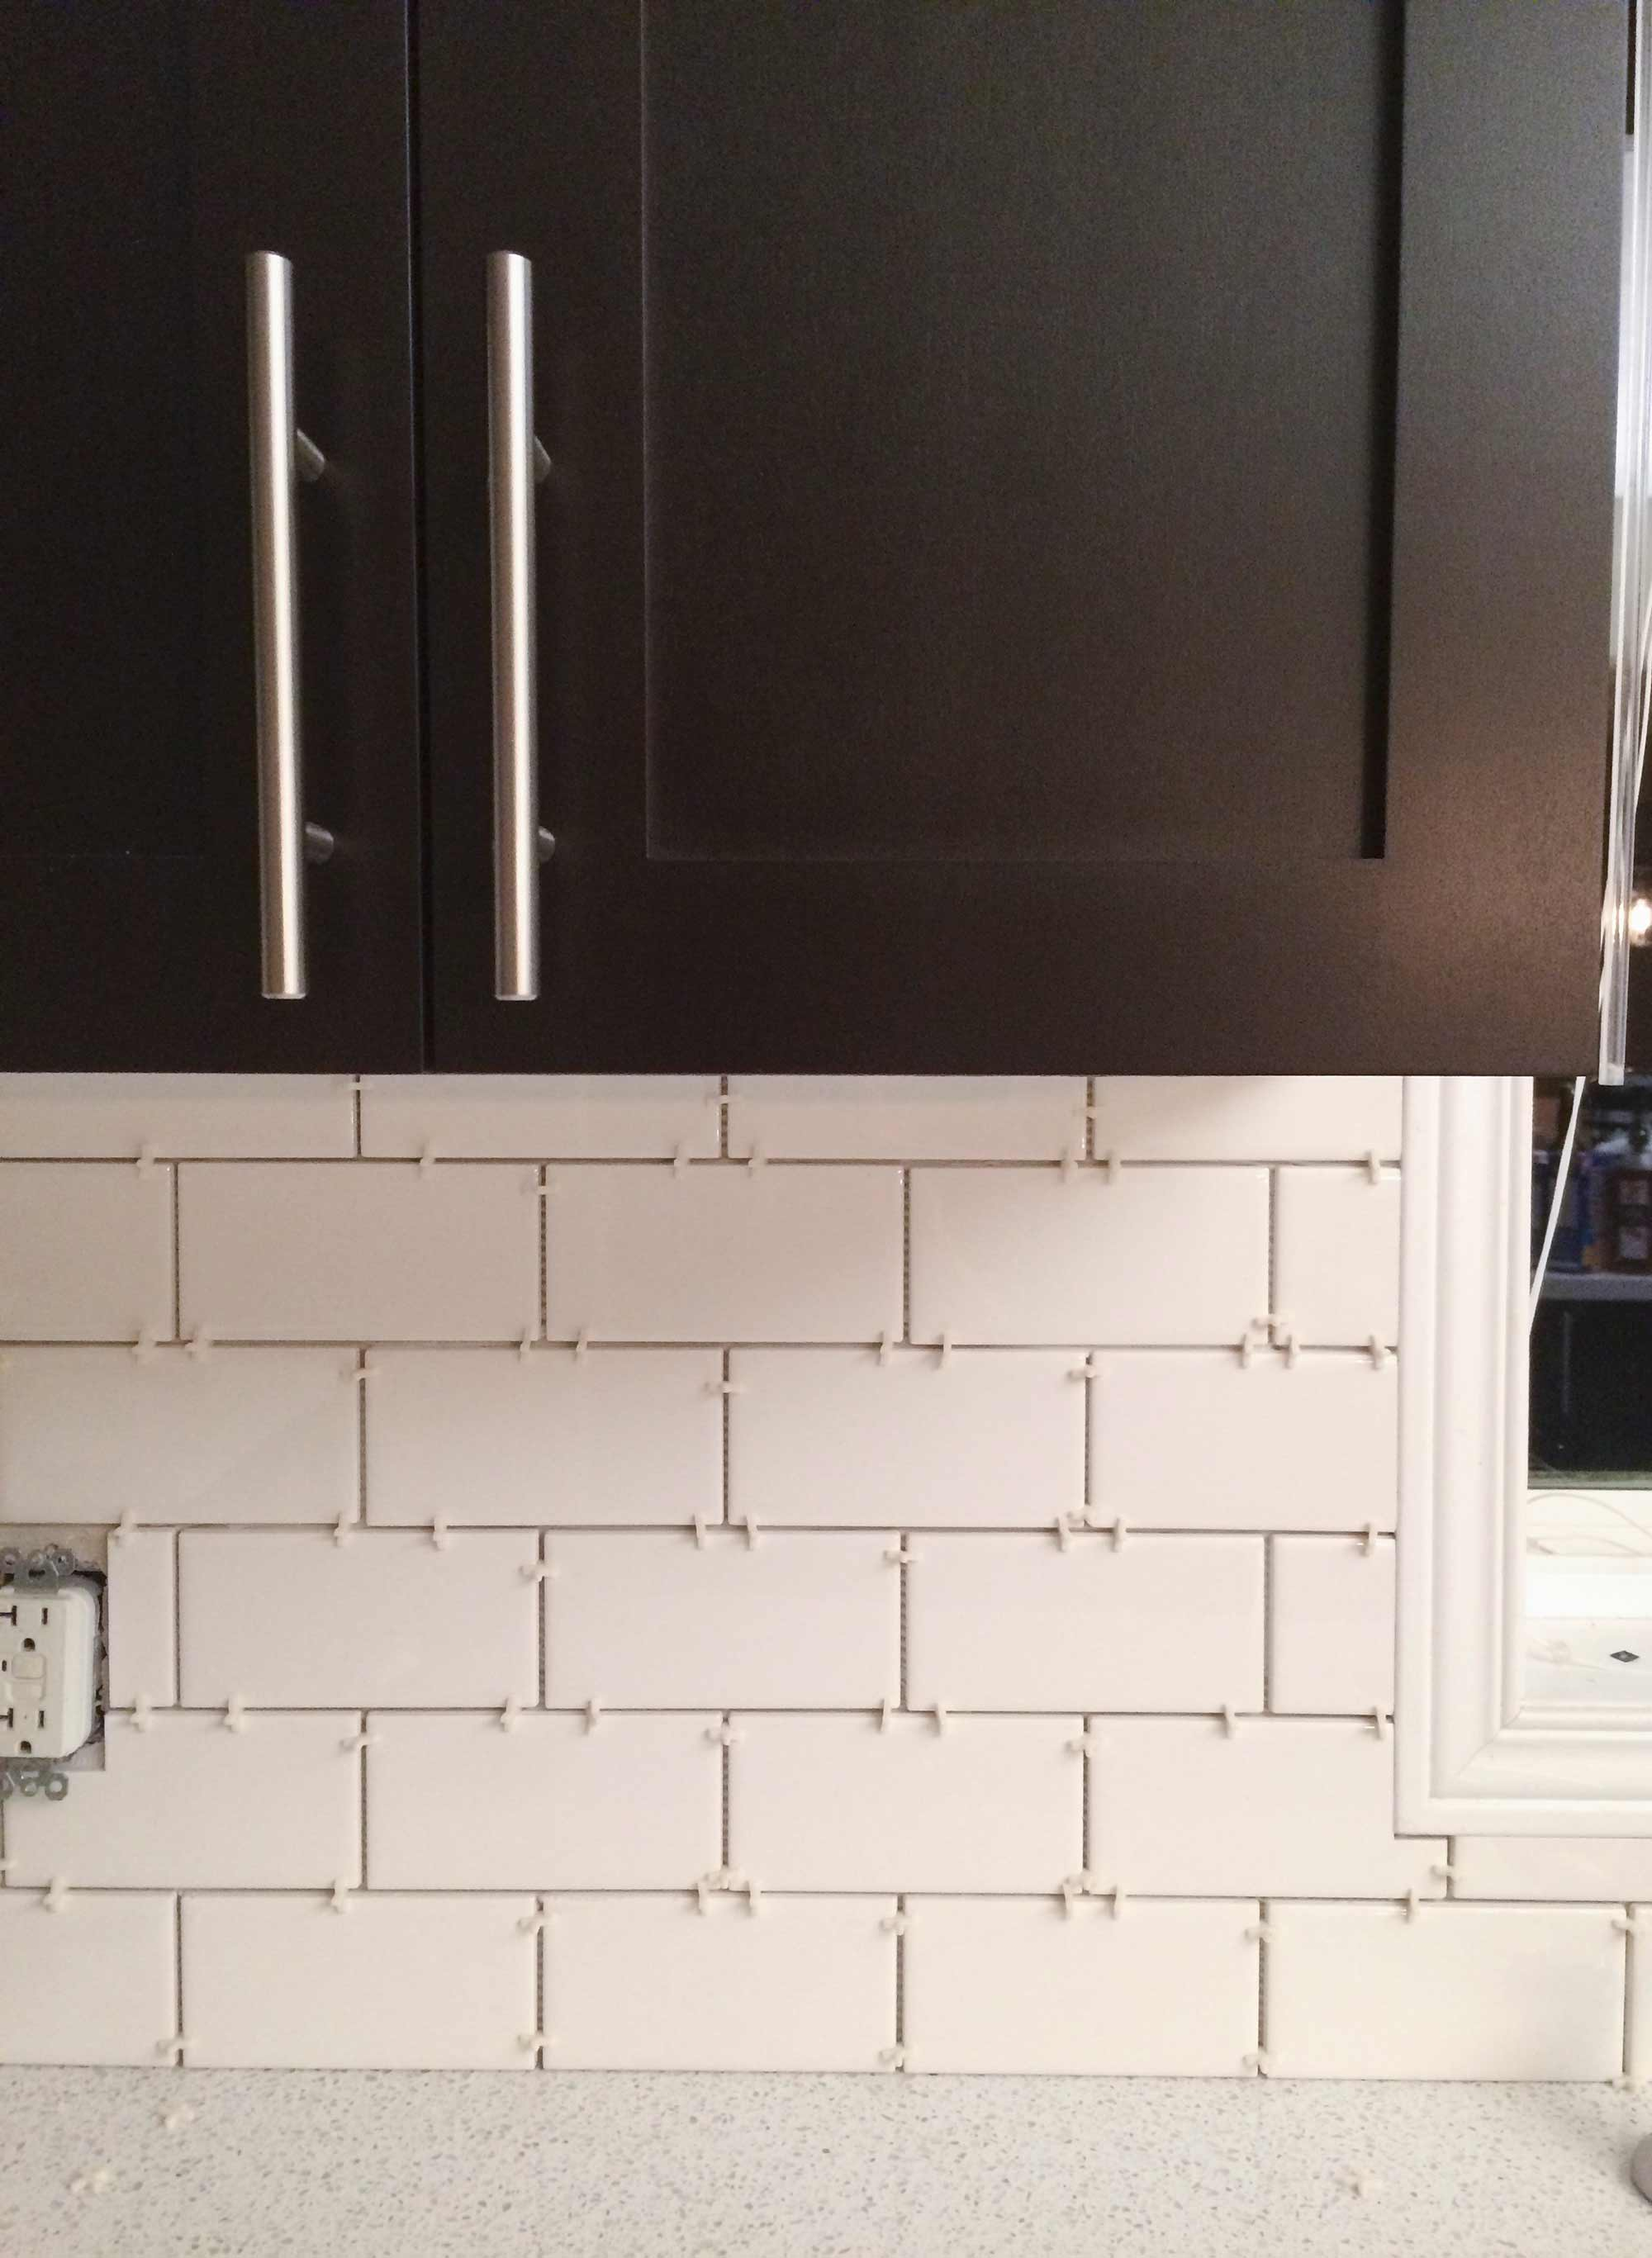 How We Installed Our Subway Tile Backsplash • Brittany Stager